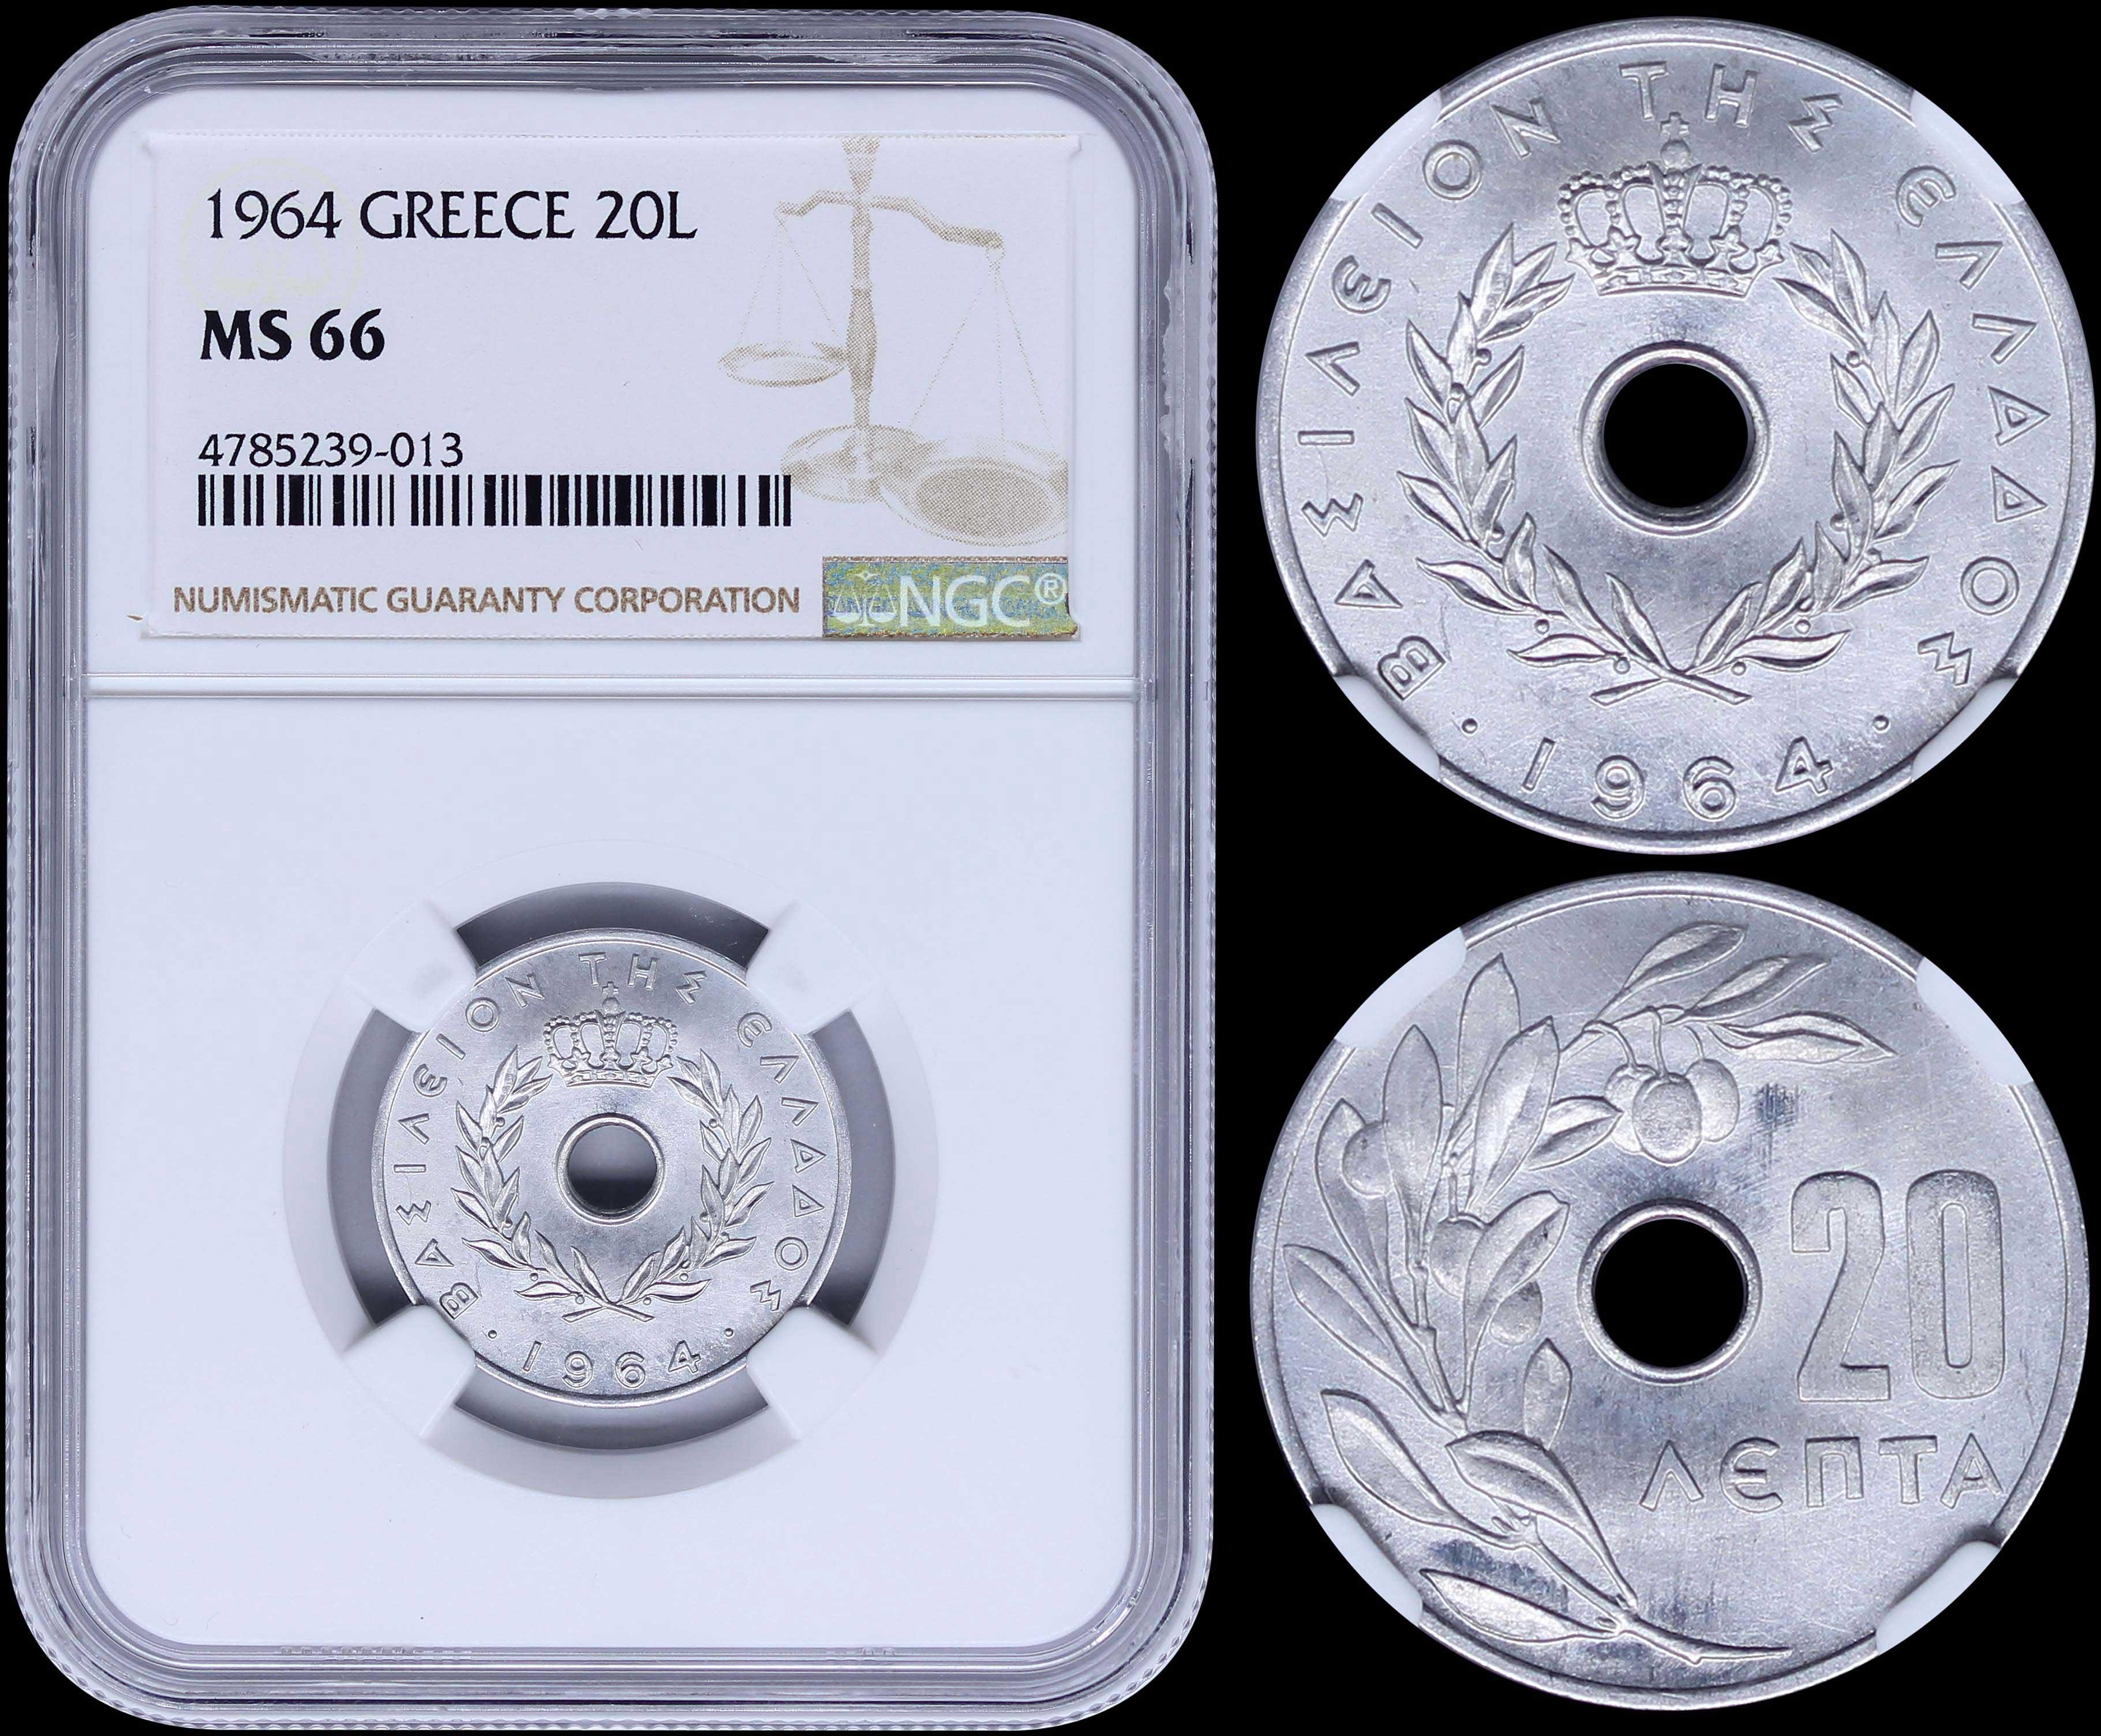 Lot 8199 - -  COINS & TOKENS king constantine ii -  A. Karamitsos Public & Live Bid Auction 644 Coins, Medals & Banknotes